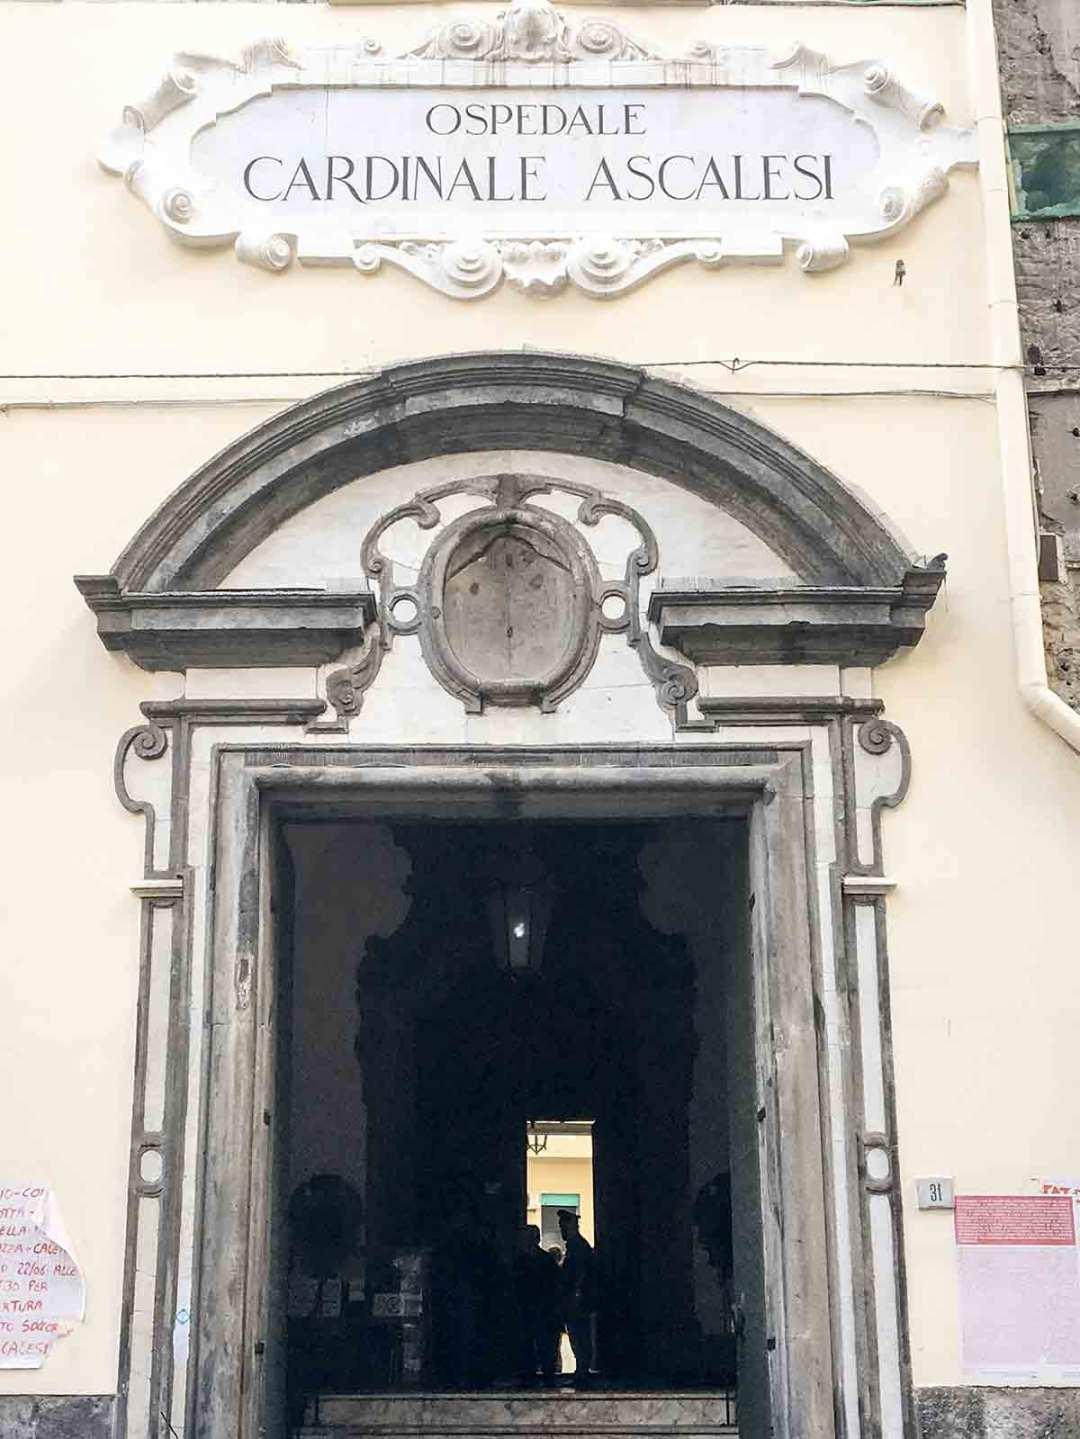 Santa Maria Egiziaca a Forcella - Ospedale Ascalesi